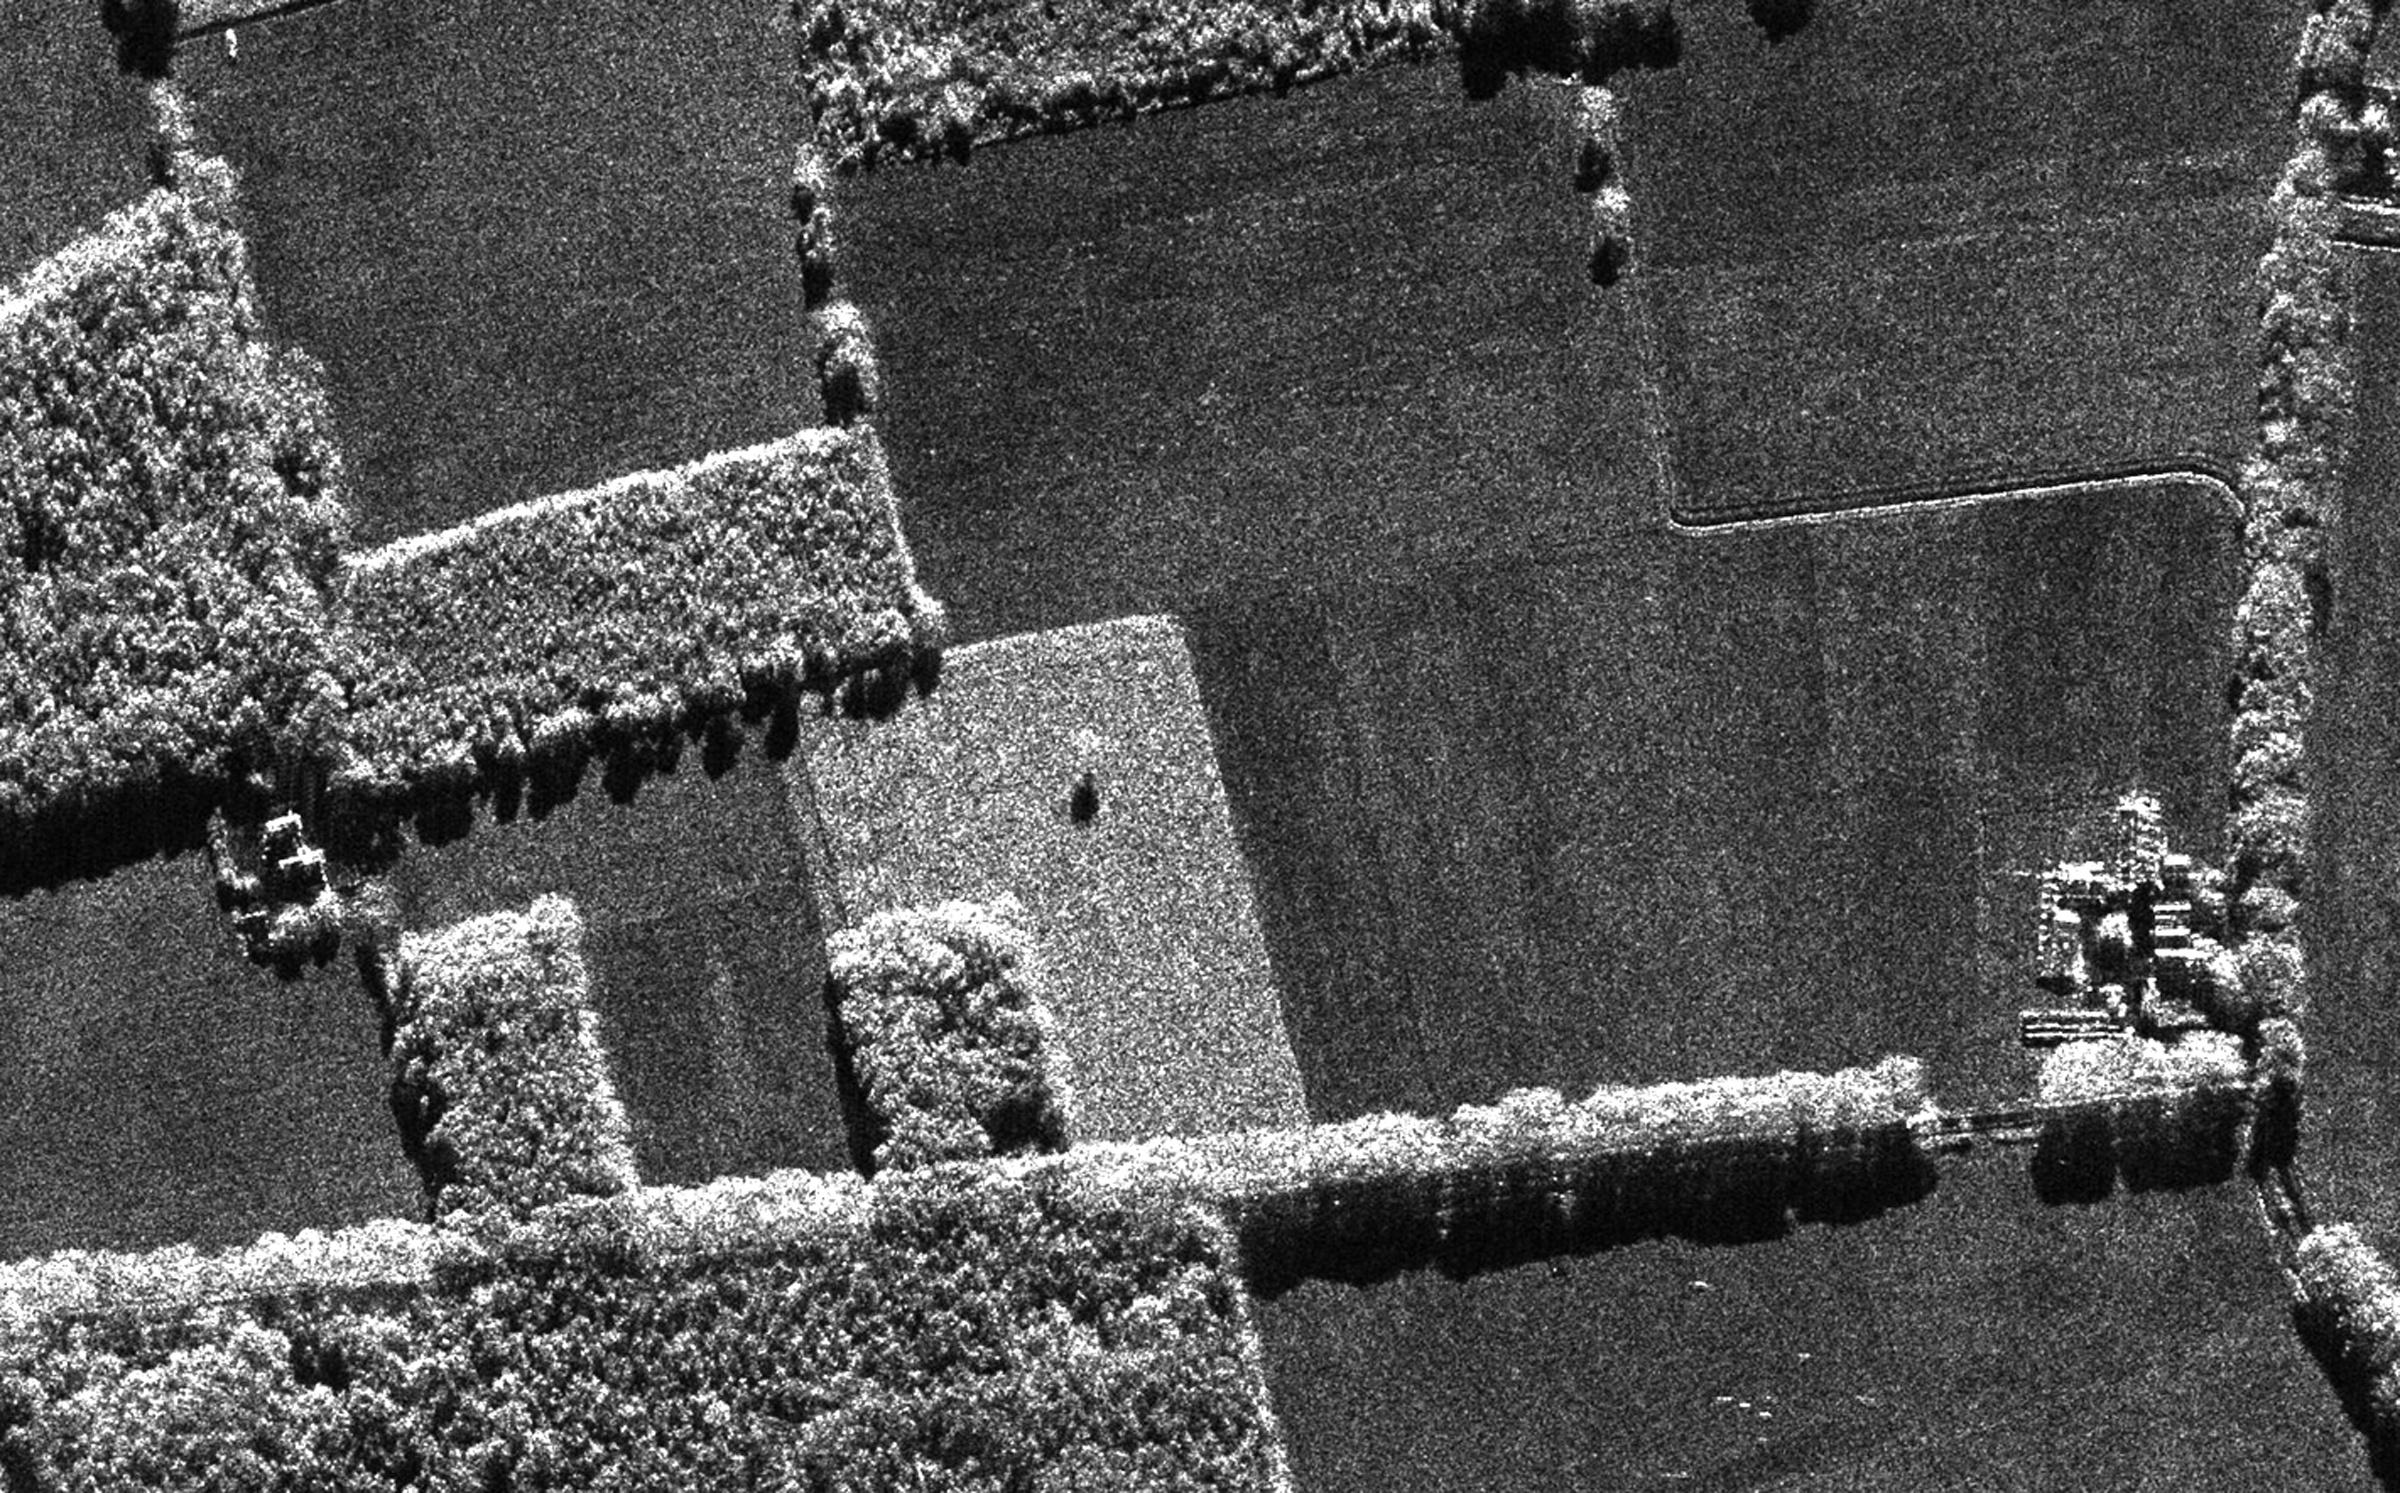 X-Band Radar Imagery